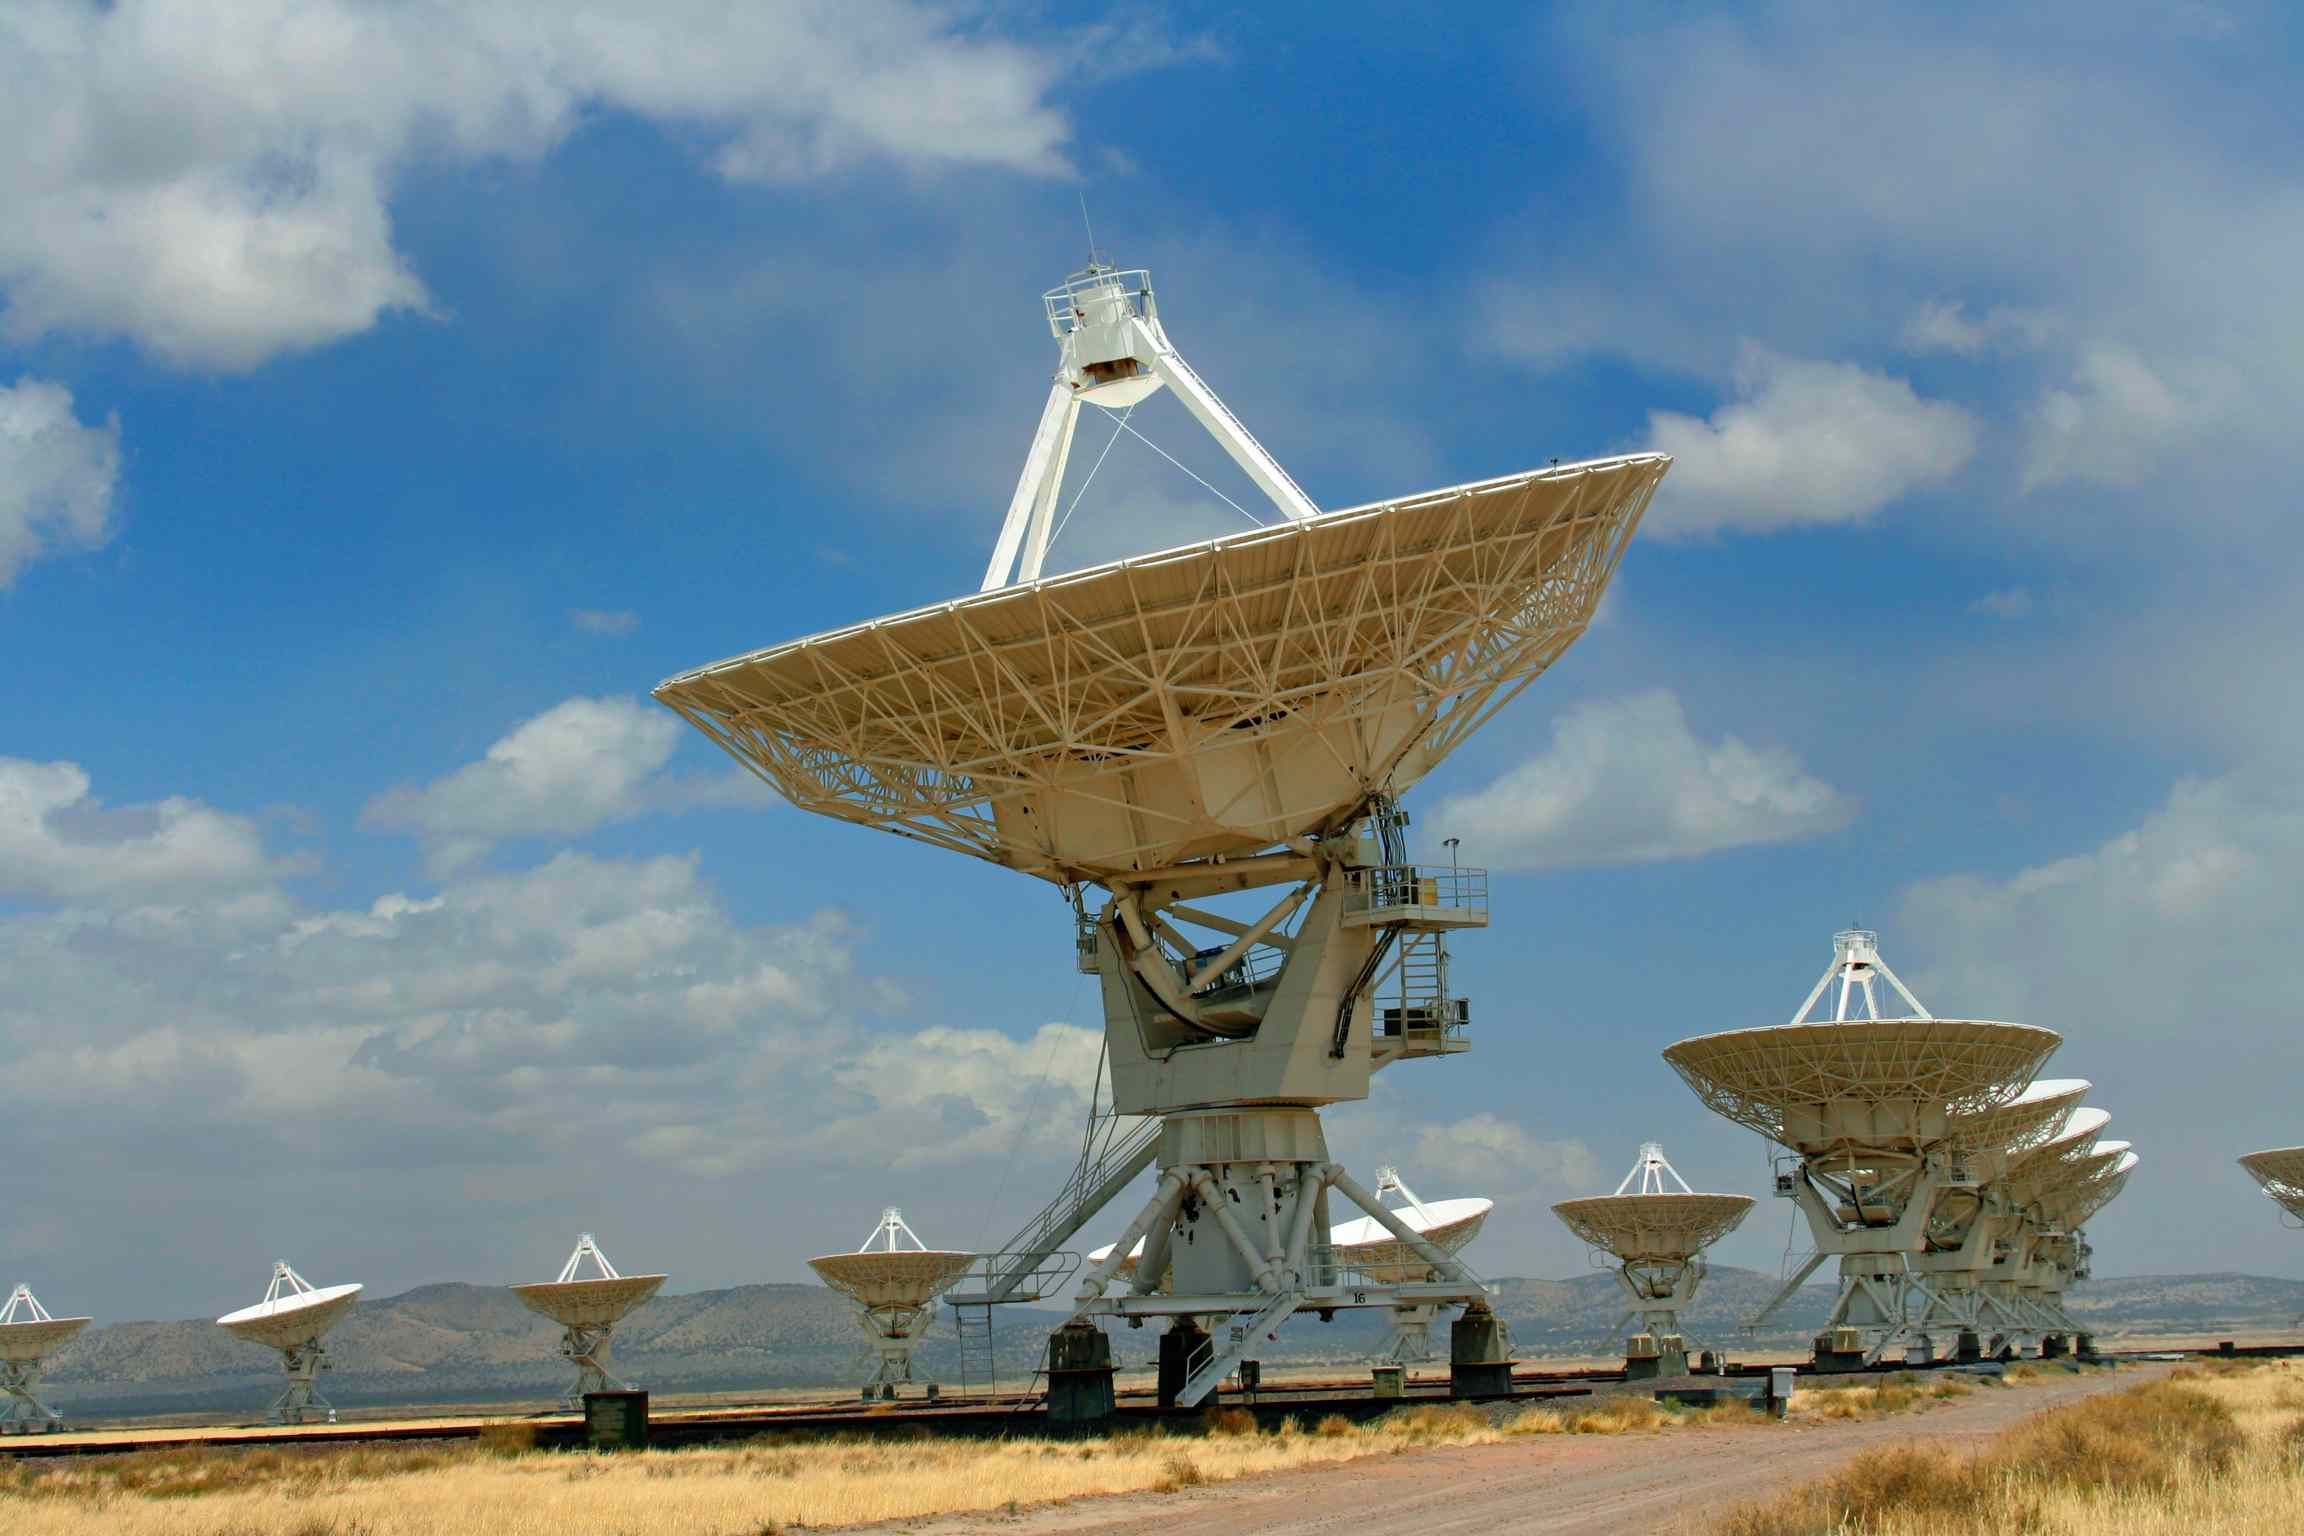 A radio telescope pointed towards the sky